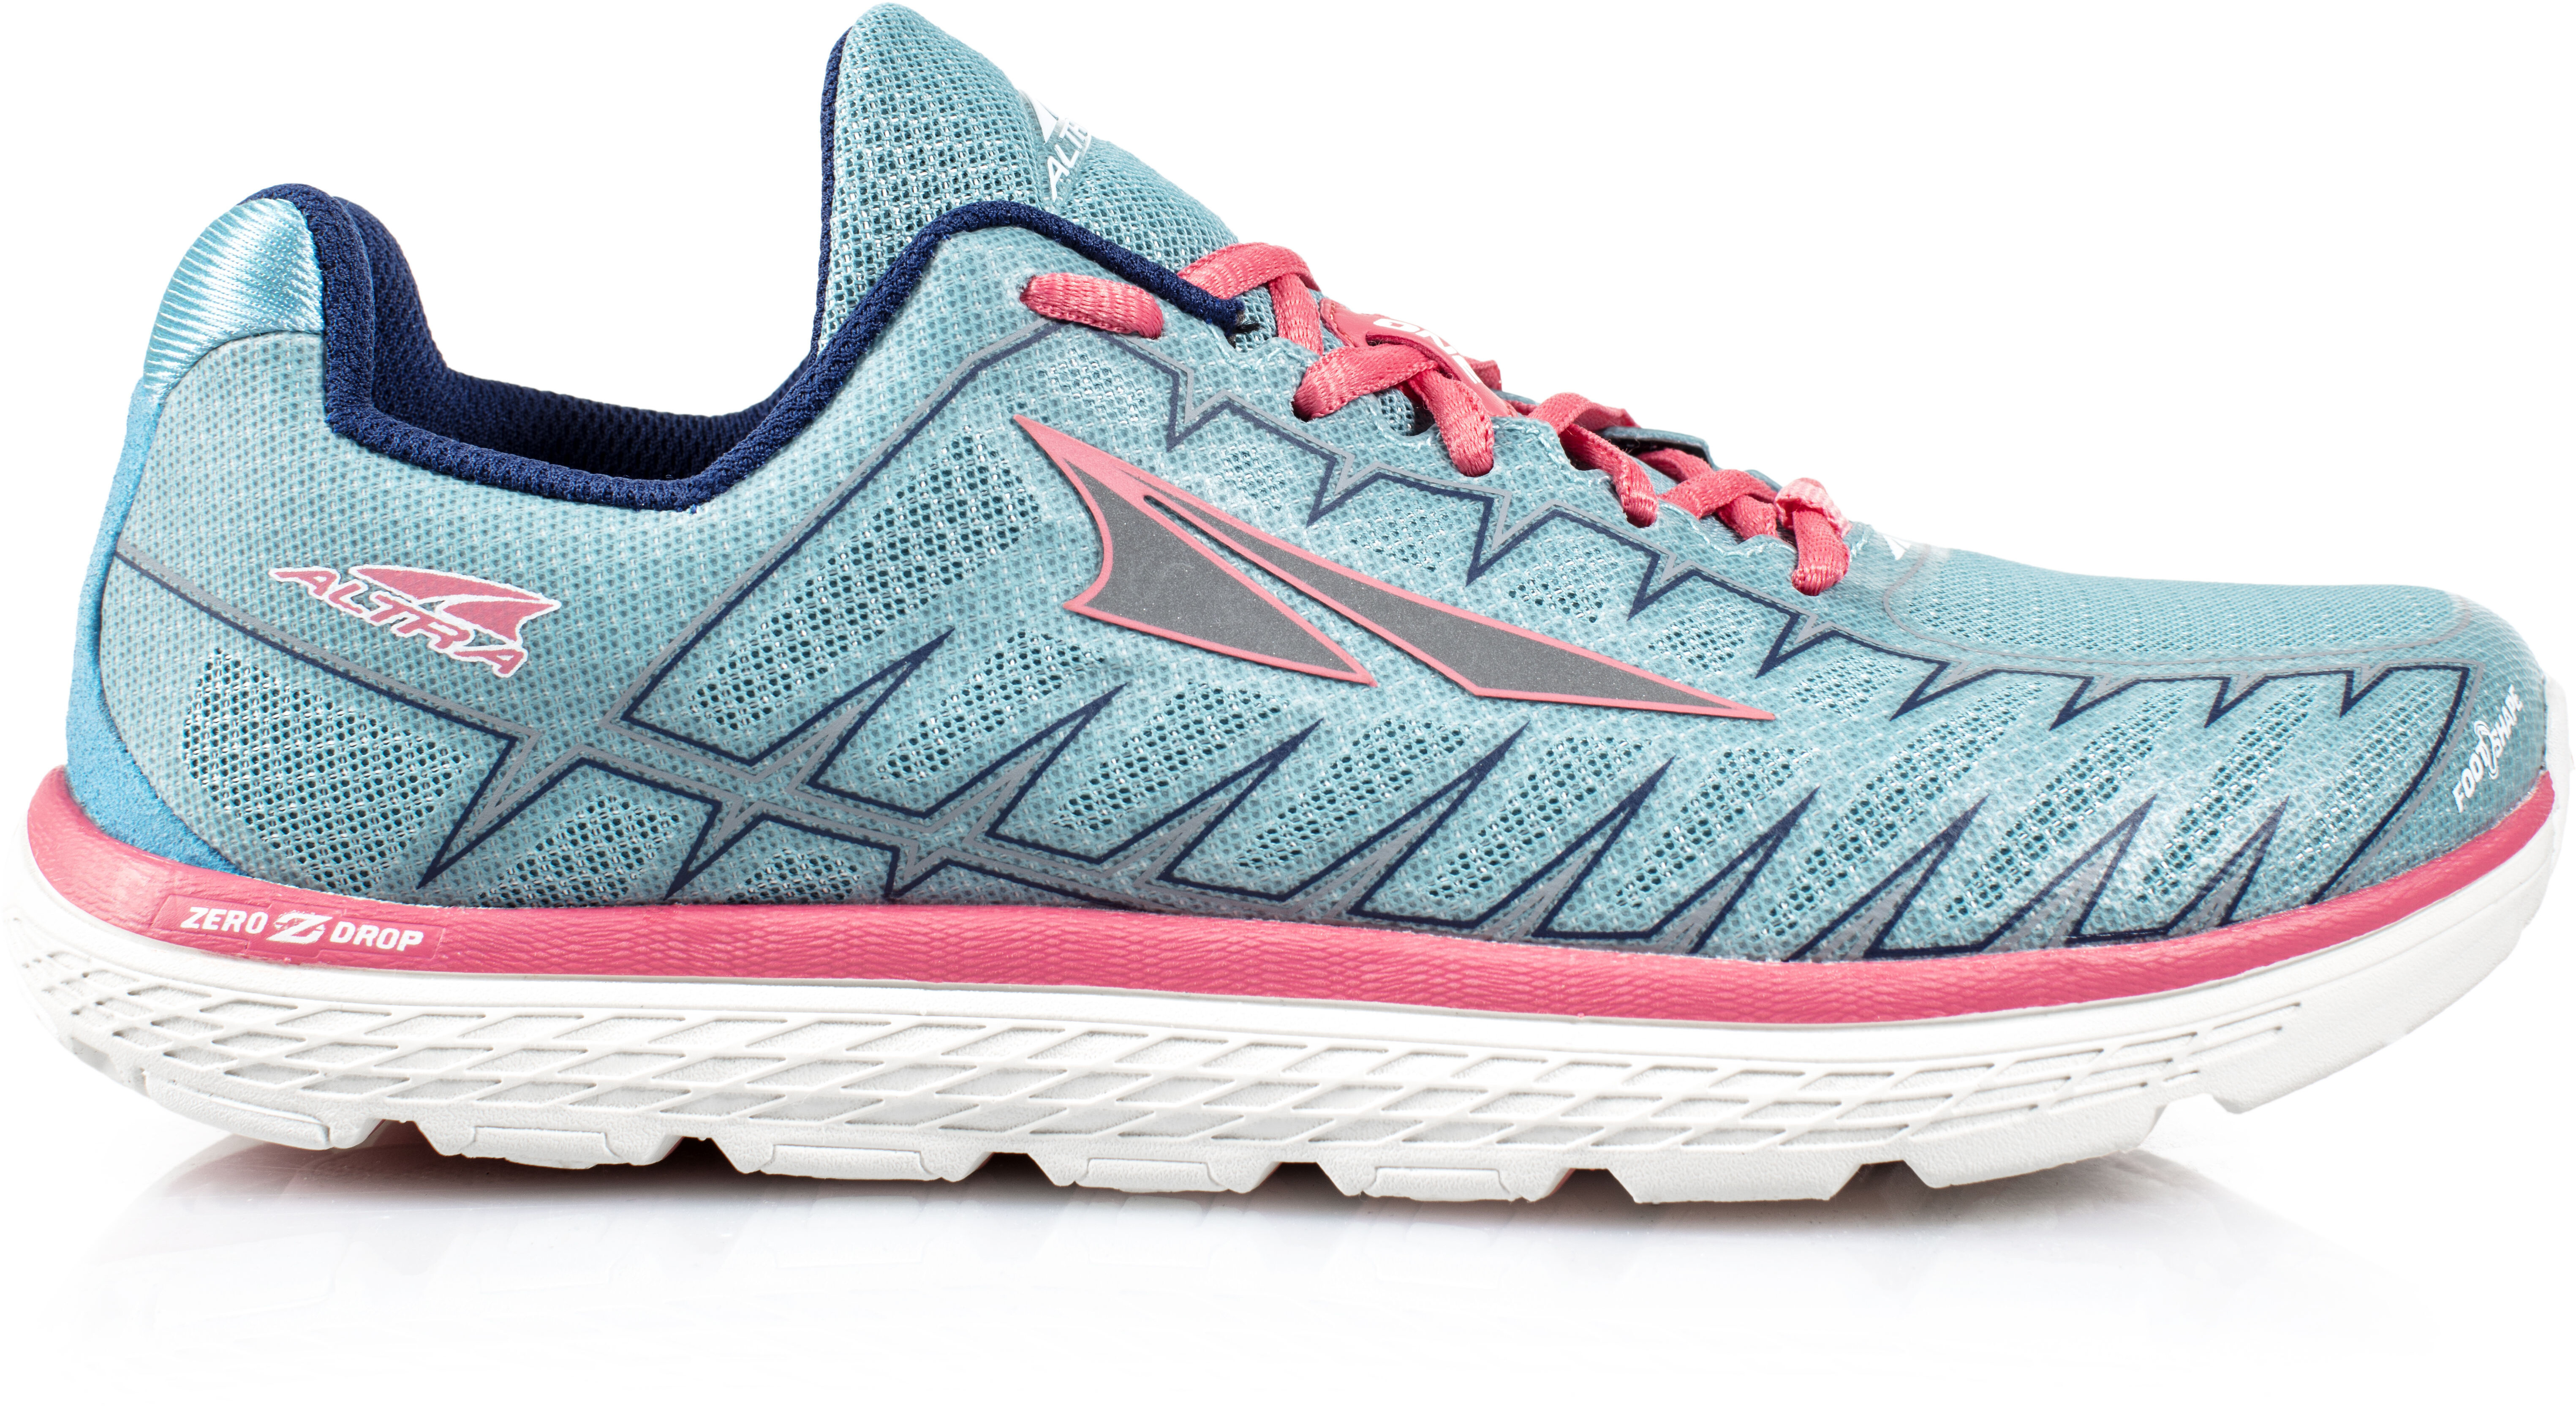 Altra One V3 Marathon Running Shoes Women Light Bluecoral Campzde